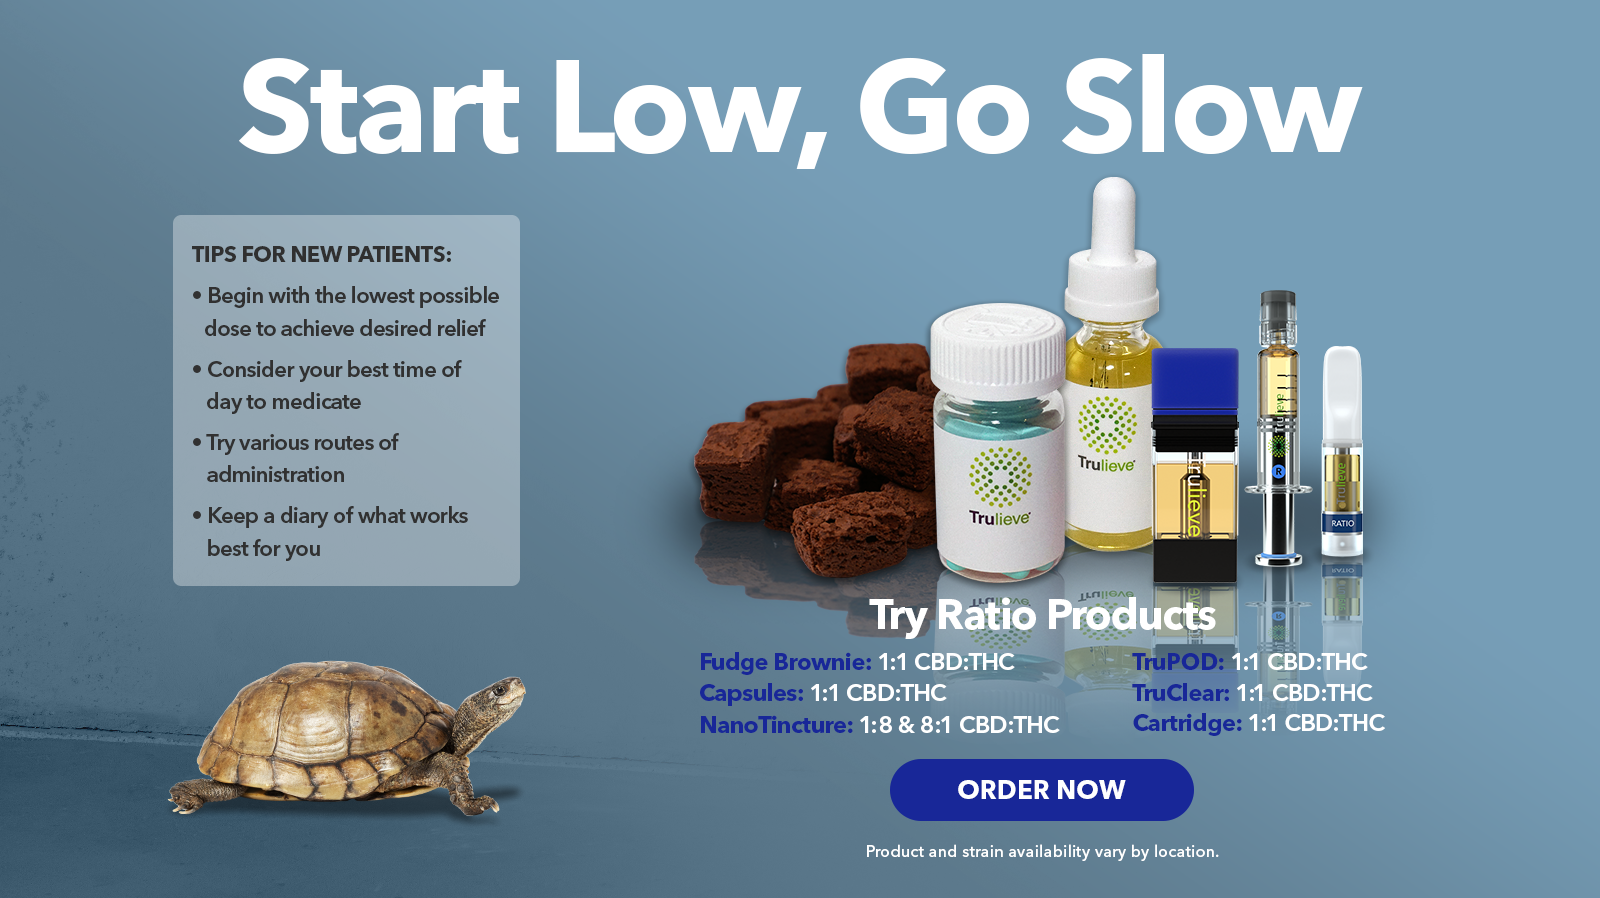 Start Low, Go Slow